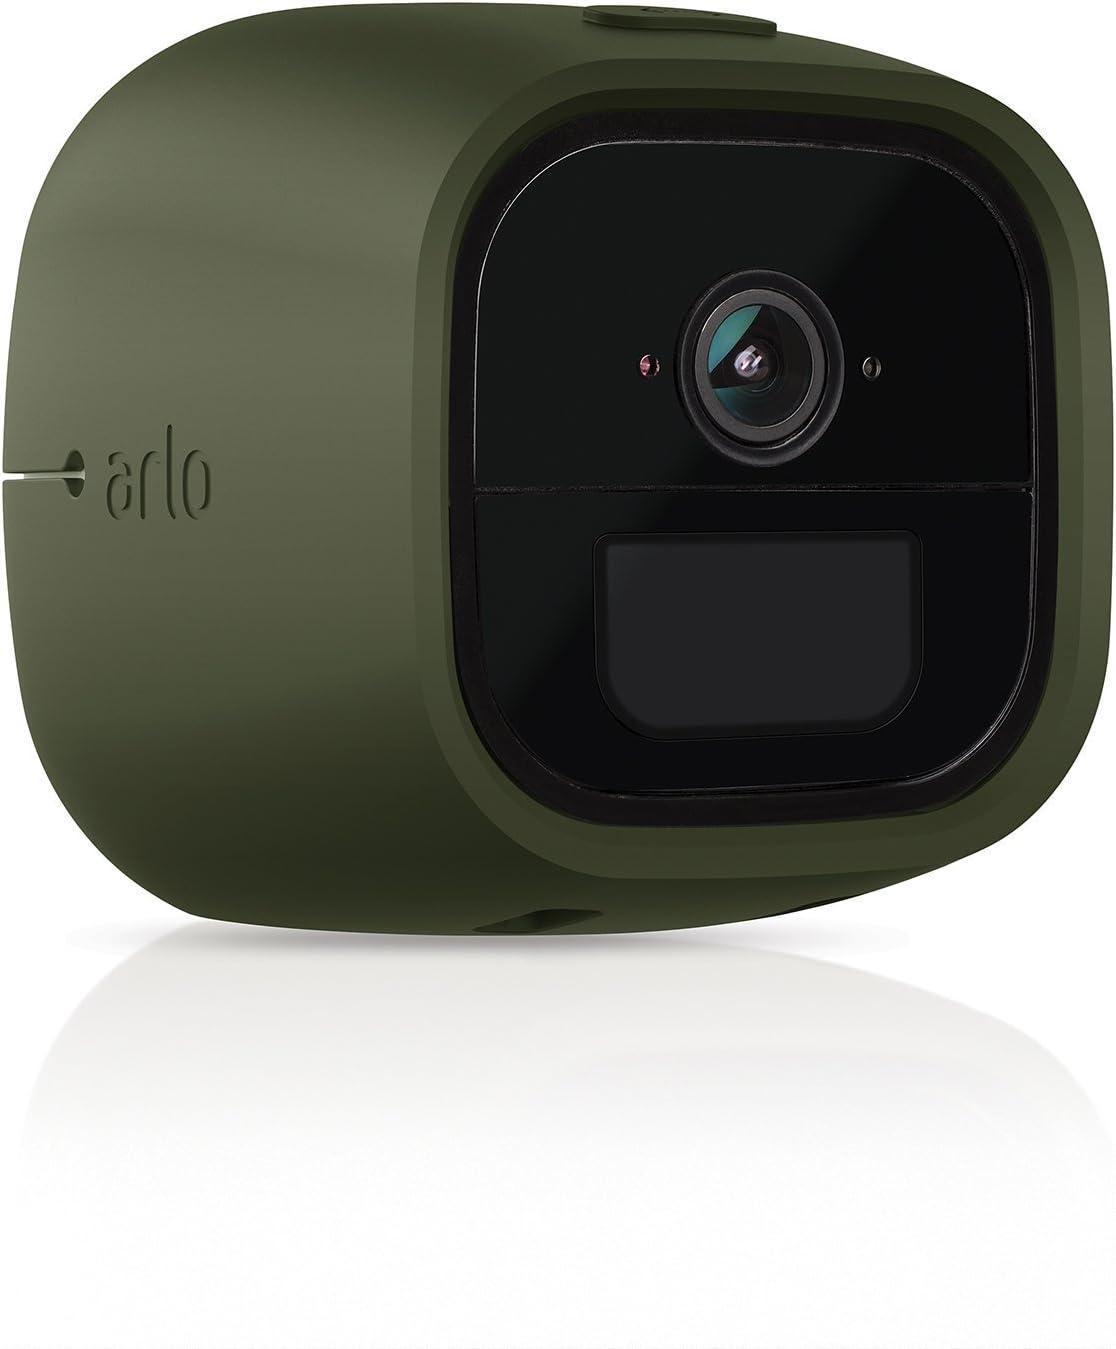 schwarz//camouflage Arlo Go LTE Silikonbez/üge offiziell, 2er Set VMA4270